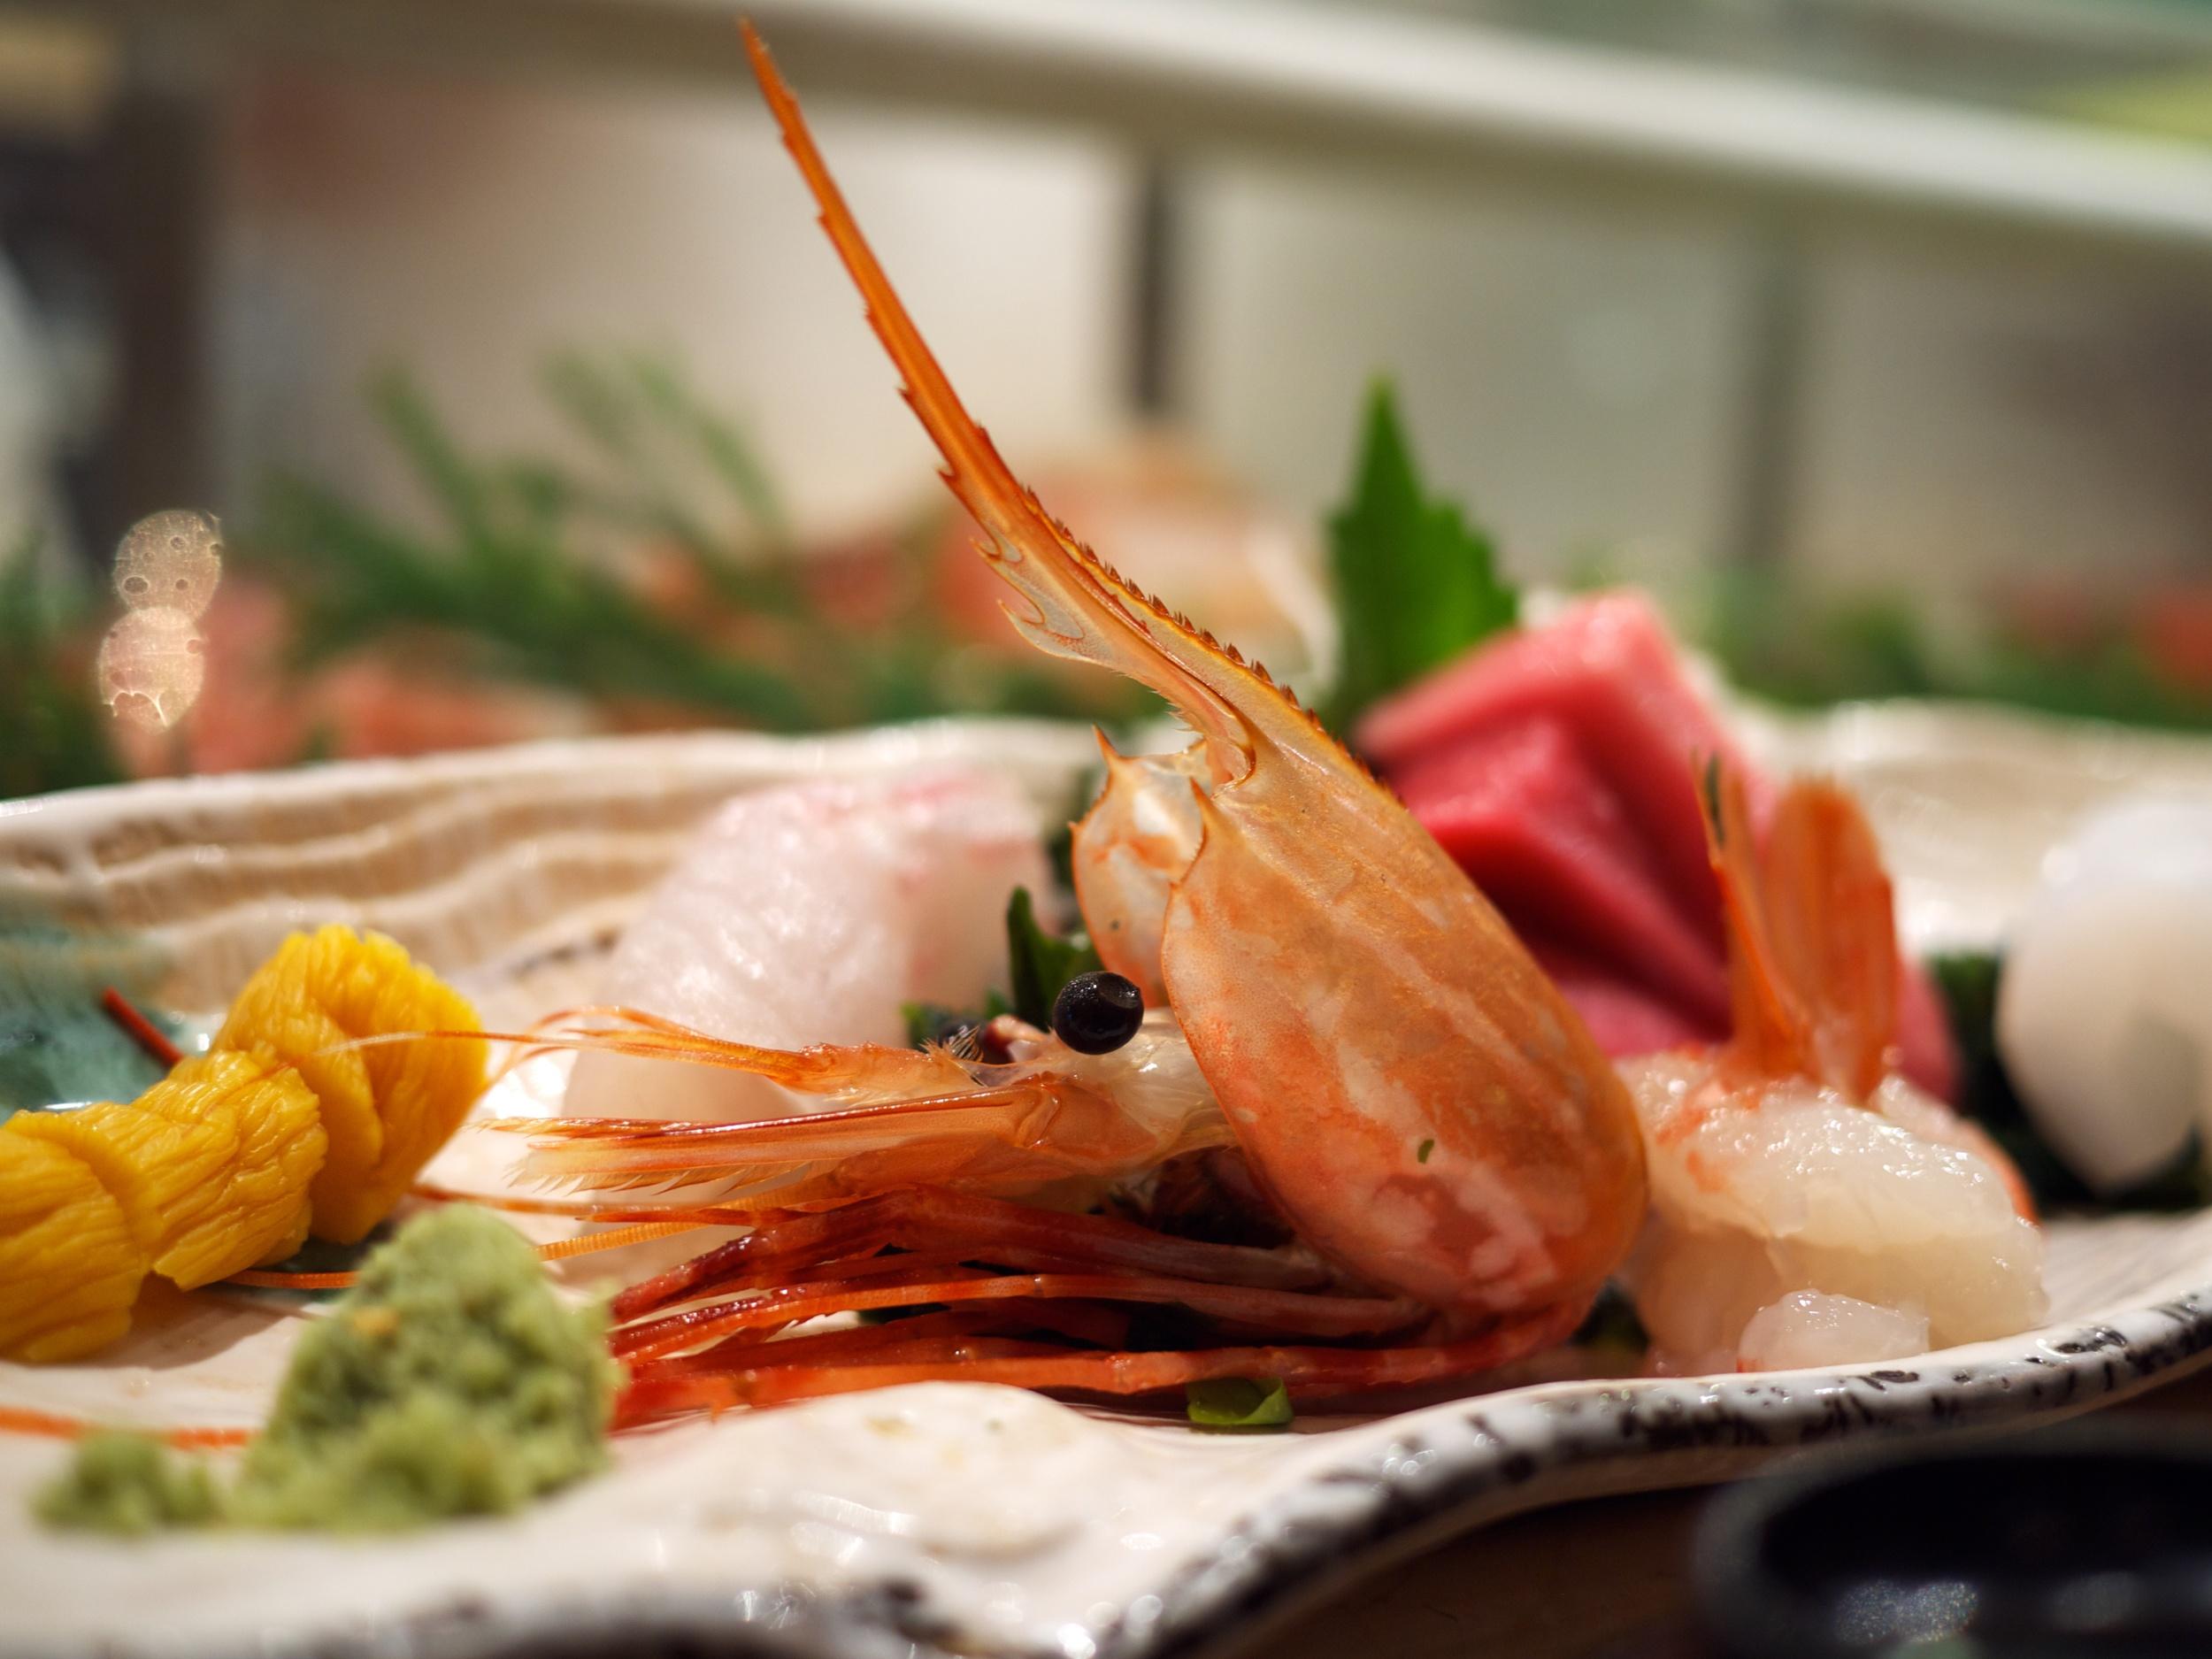 FOOD-SushiShin_2011-09-04_12-22-46_P1040262_©JosephLinaschke2011.jpg